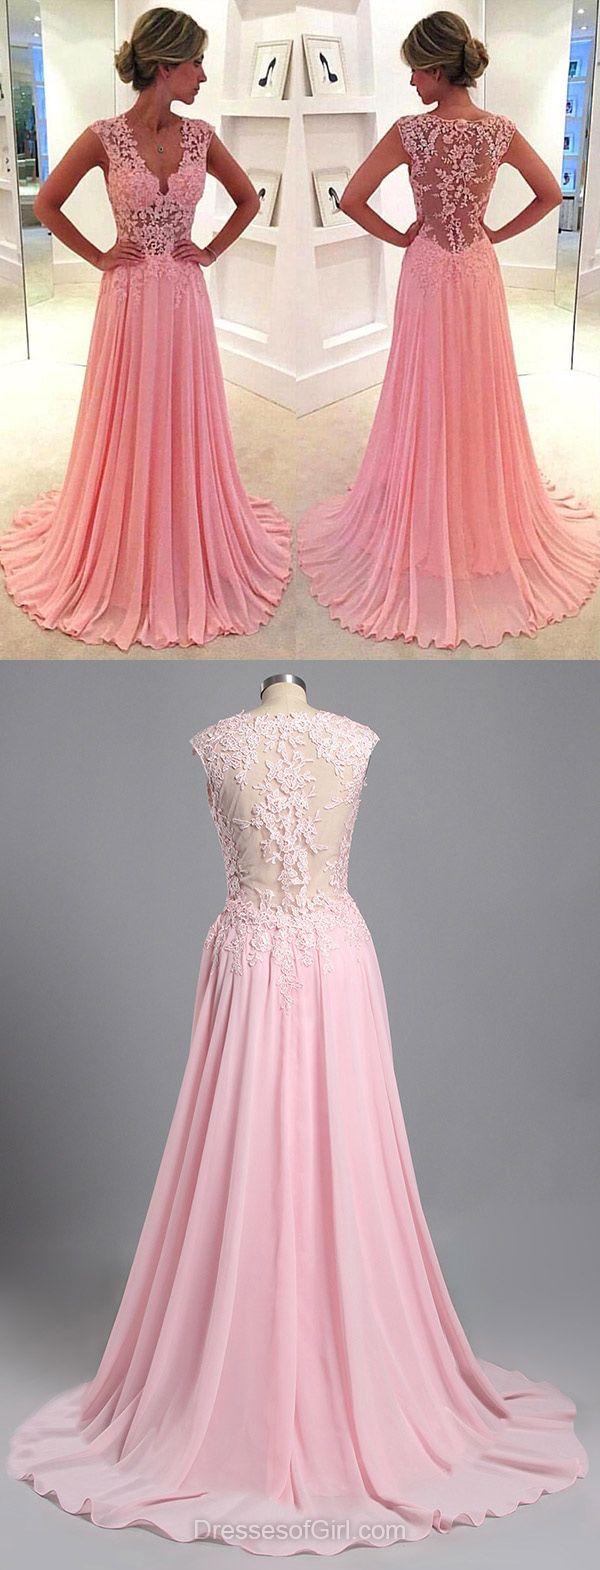 Prom Dresses | Dress | Pinterest | Vestiditos, Vestidos de fiesta y ...